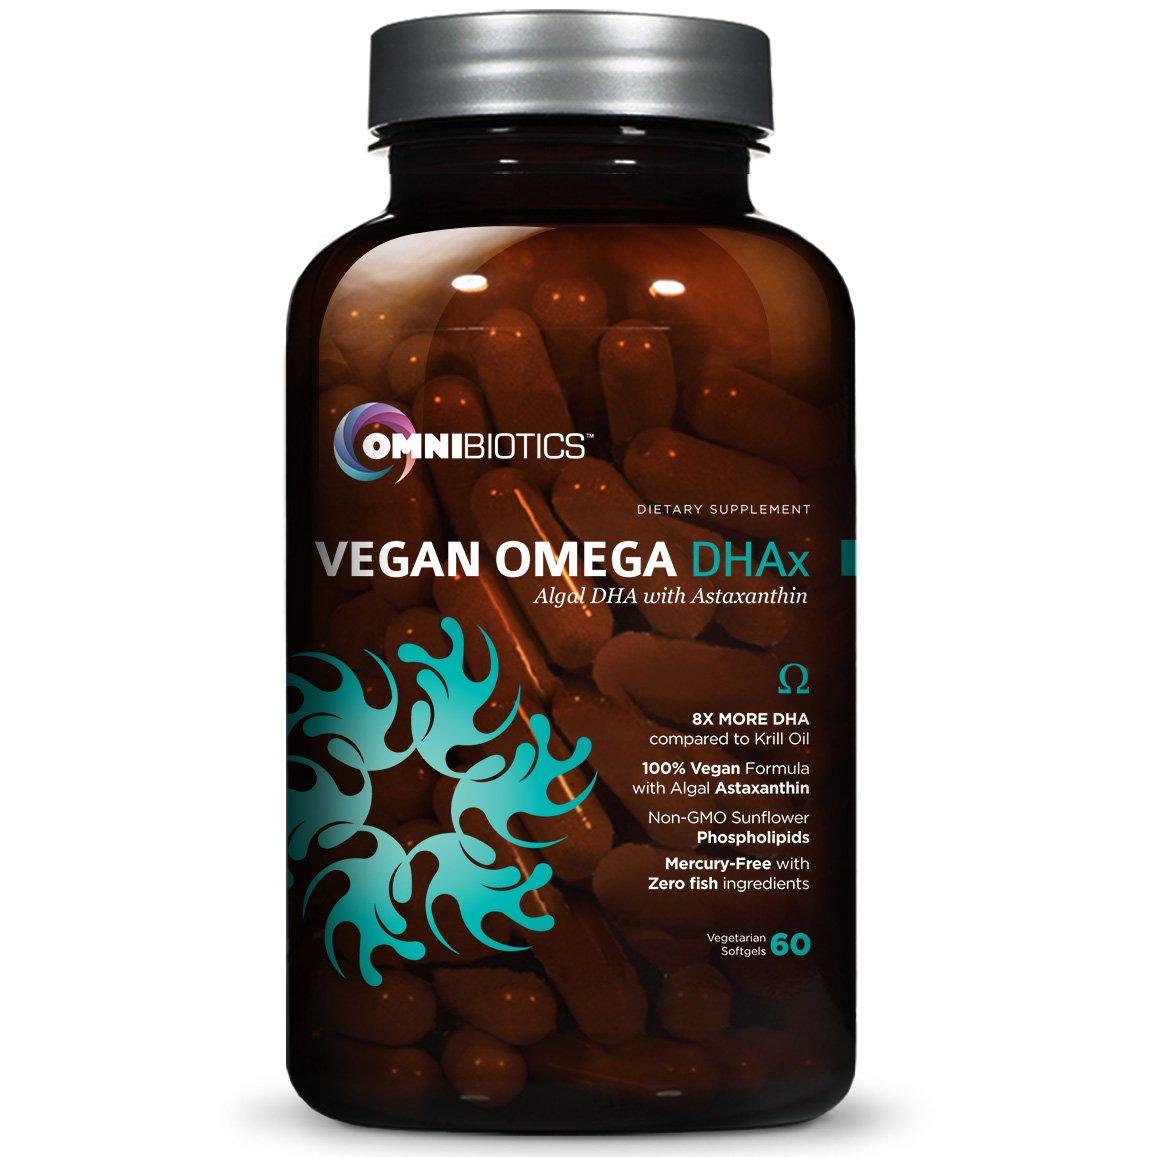 Vegan DHA | MD-Certified Prenatal DHA | 8X MORE DHA than Krill Oil! Fish-Free Omega Essential Fatty Acids - Algal Omega-3, Omega-6, DHA | 60 vegetarian softgels